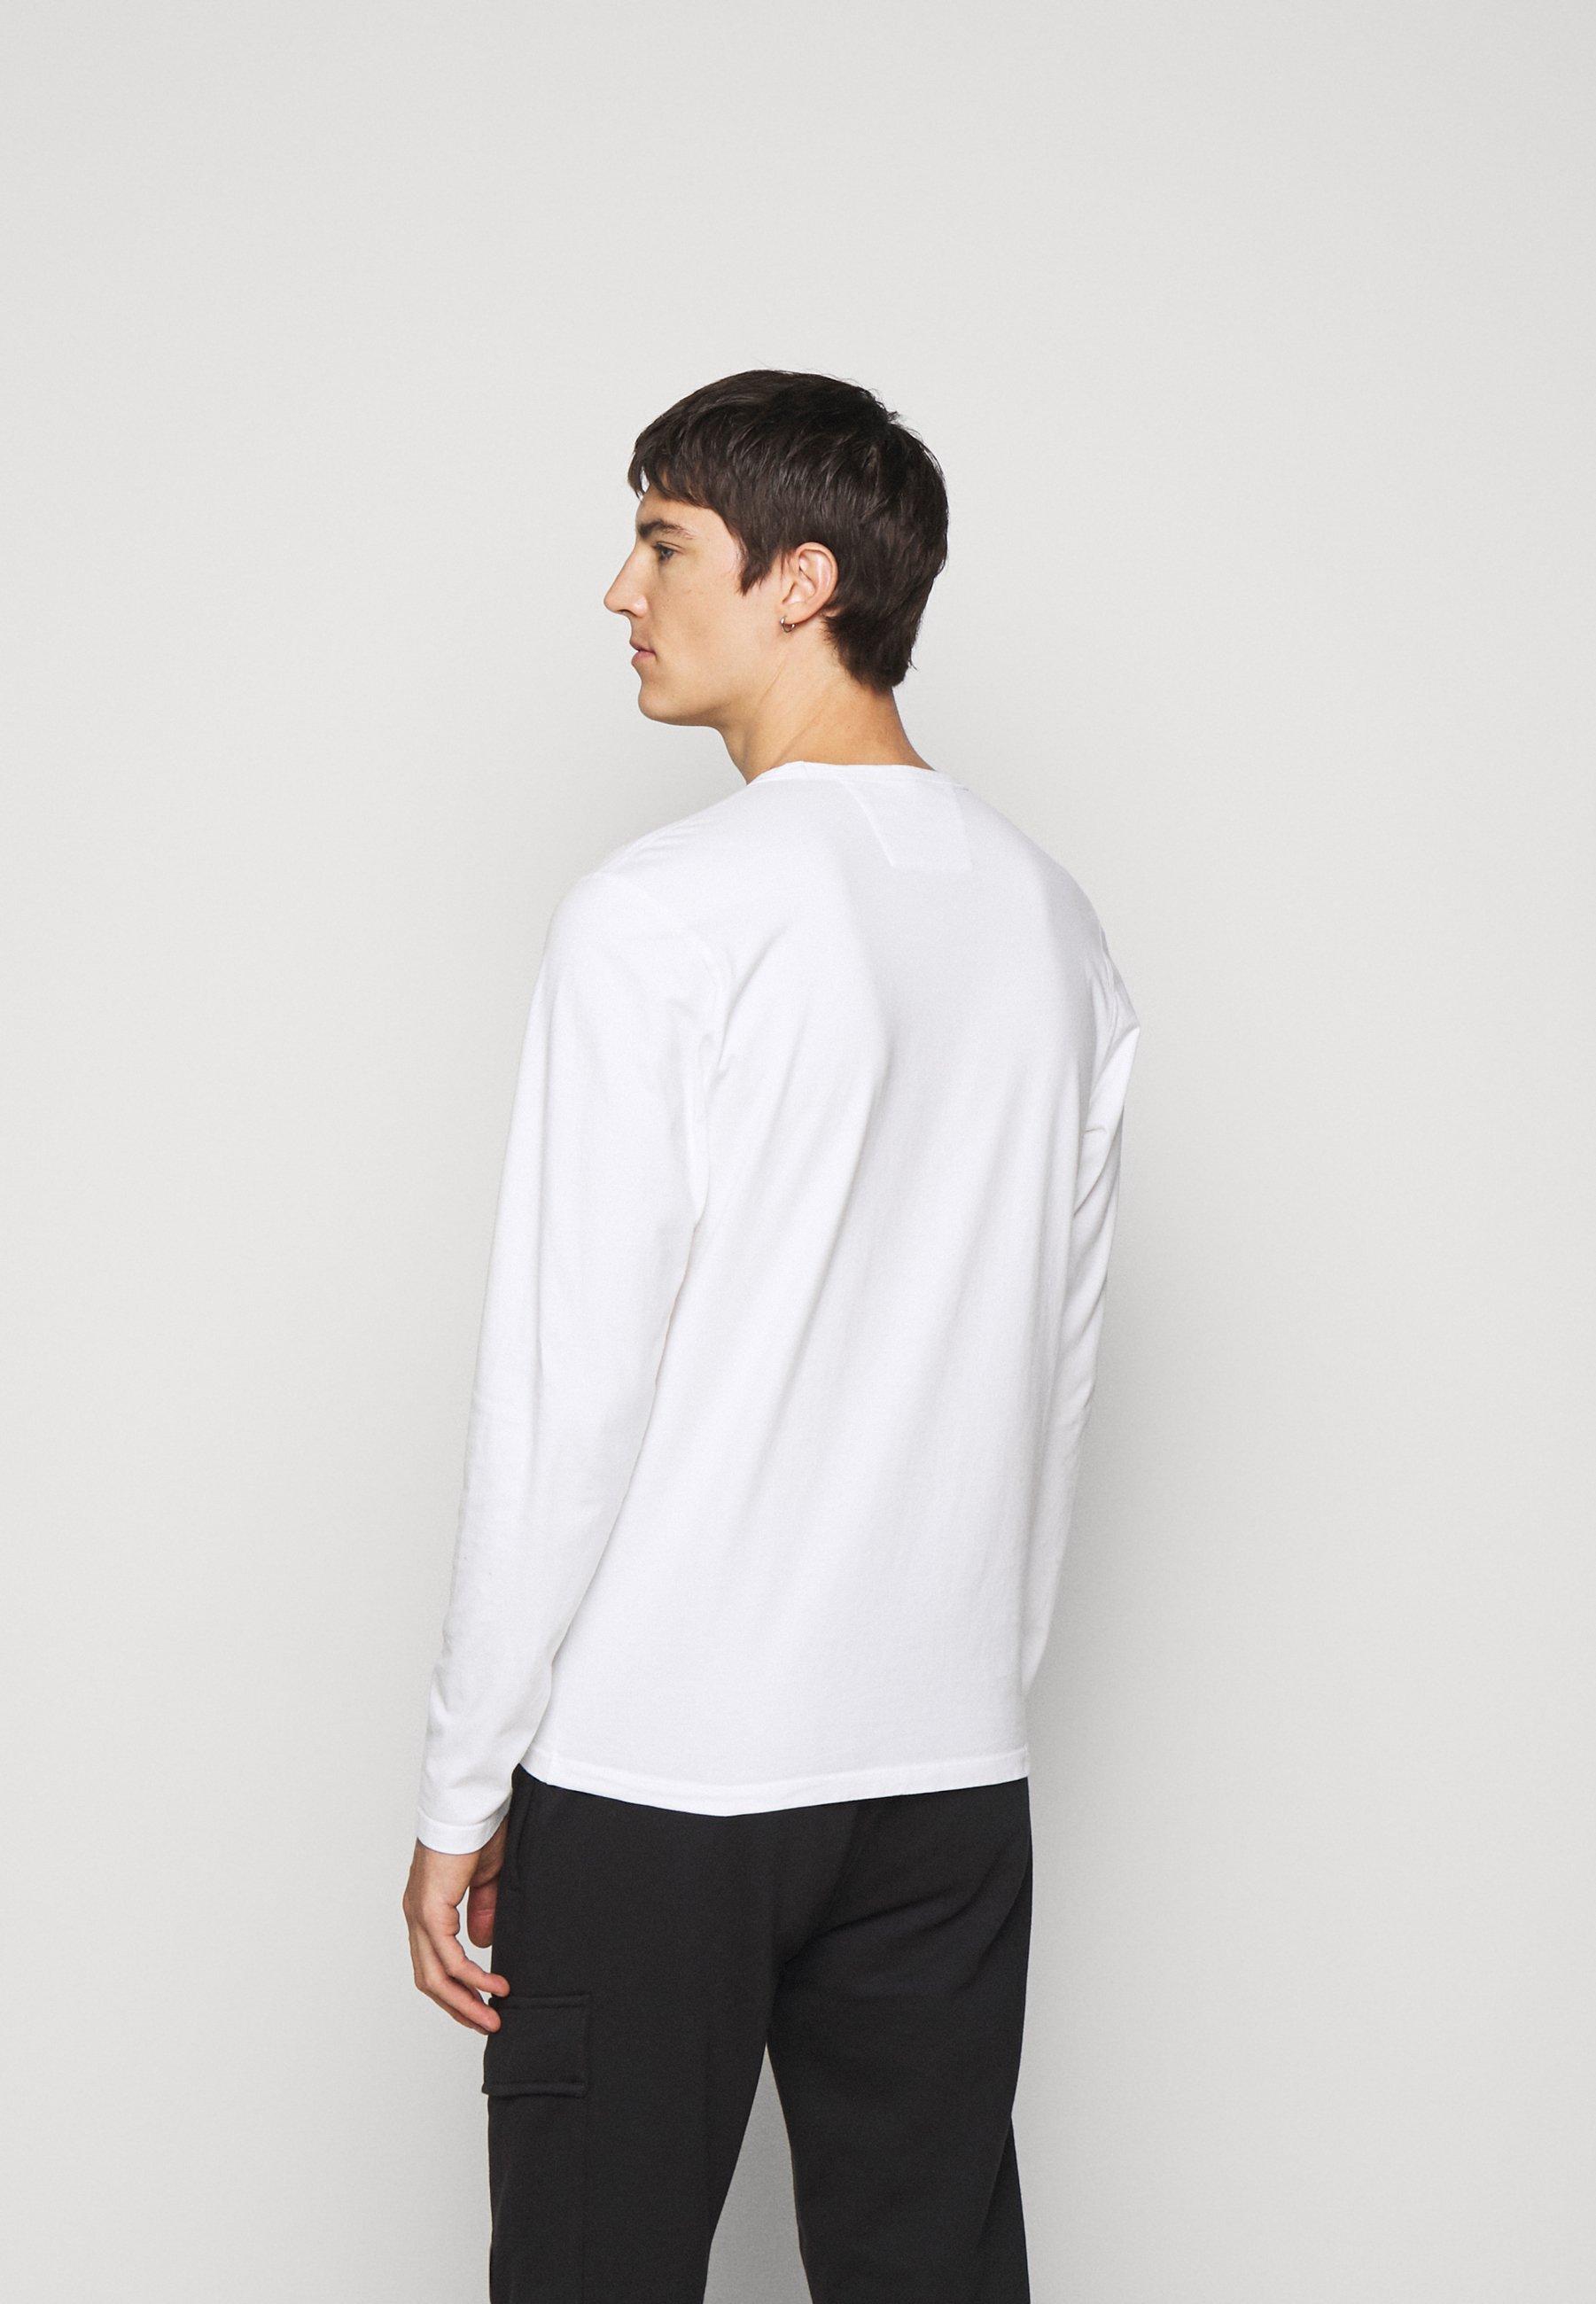 C.P. Company Long sleeved top - gauze white UZxeg